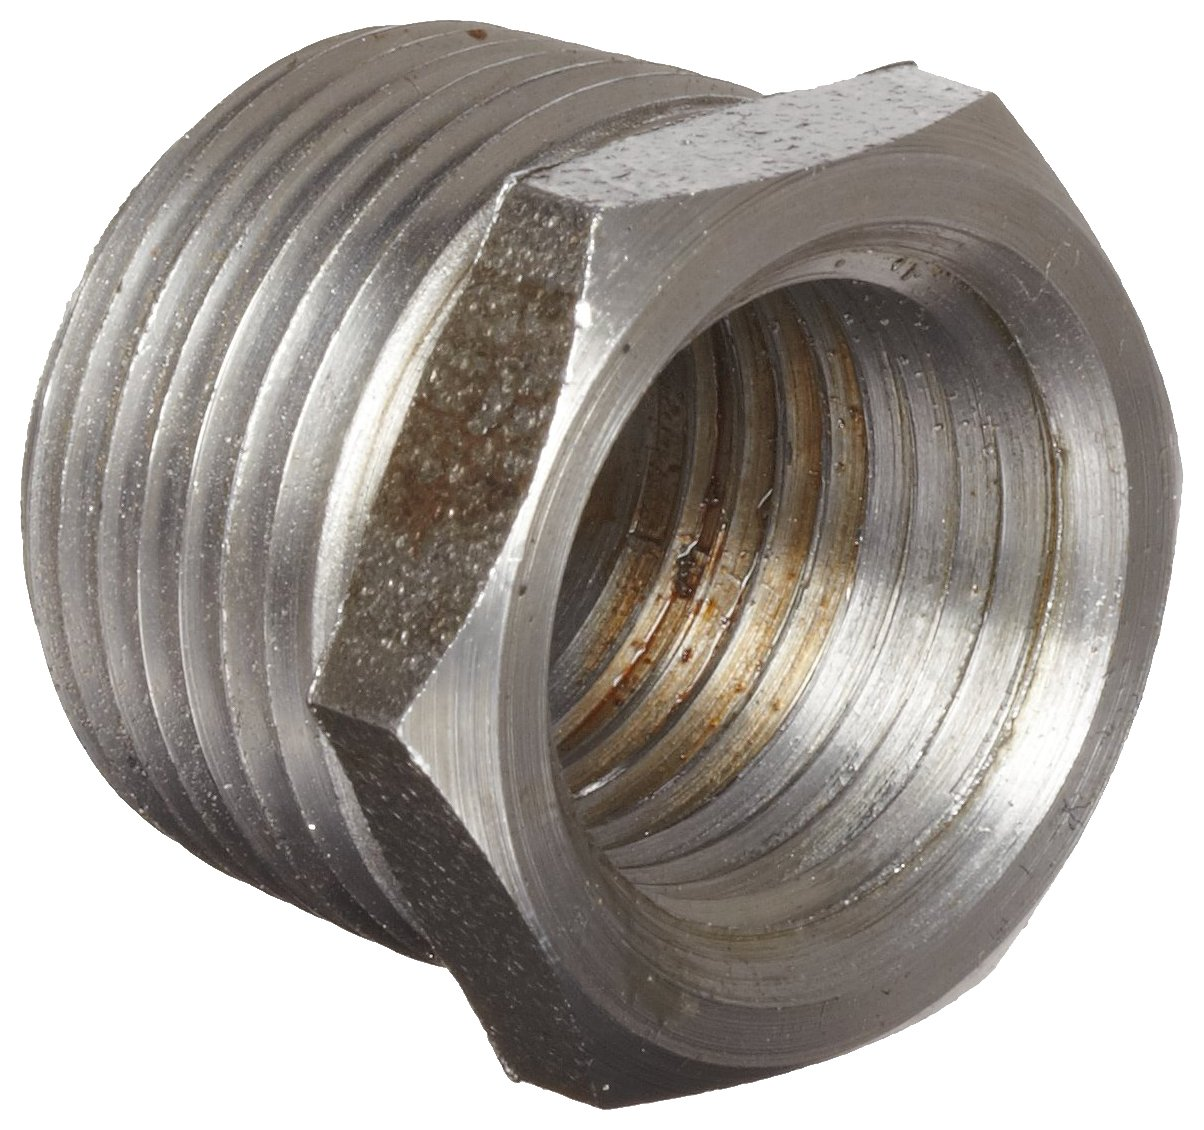 Anvil 8700129508 1-1//4 NPT Male x 1 NPT Female Malleable Iron Pipe Fitting Hex Bushing Black Finish